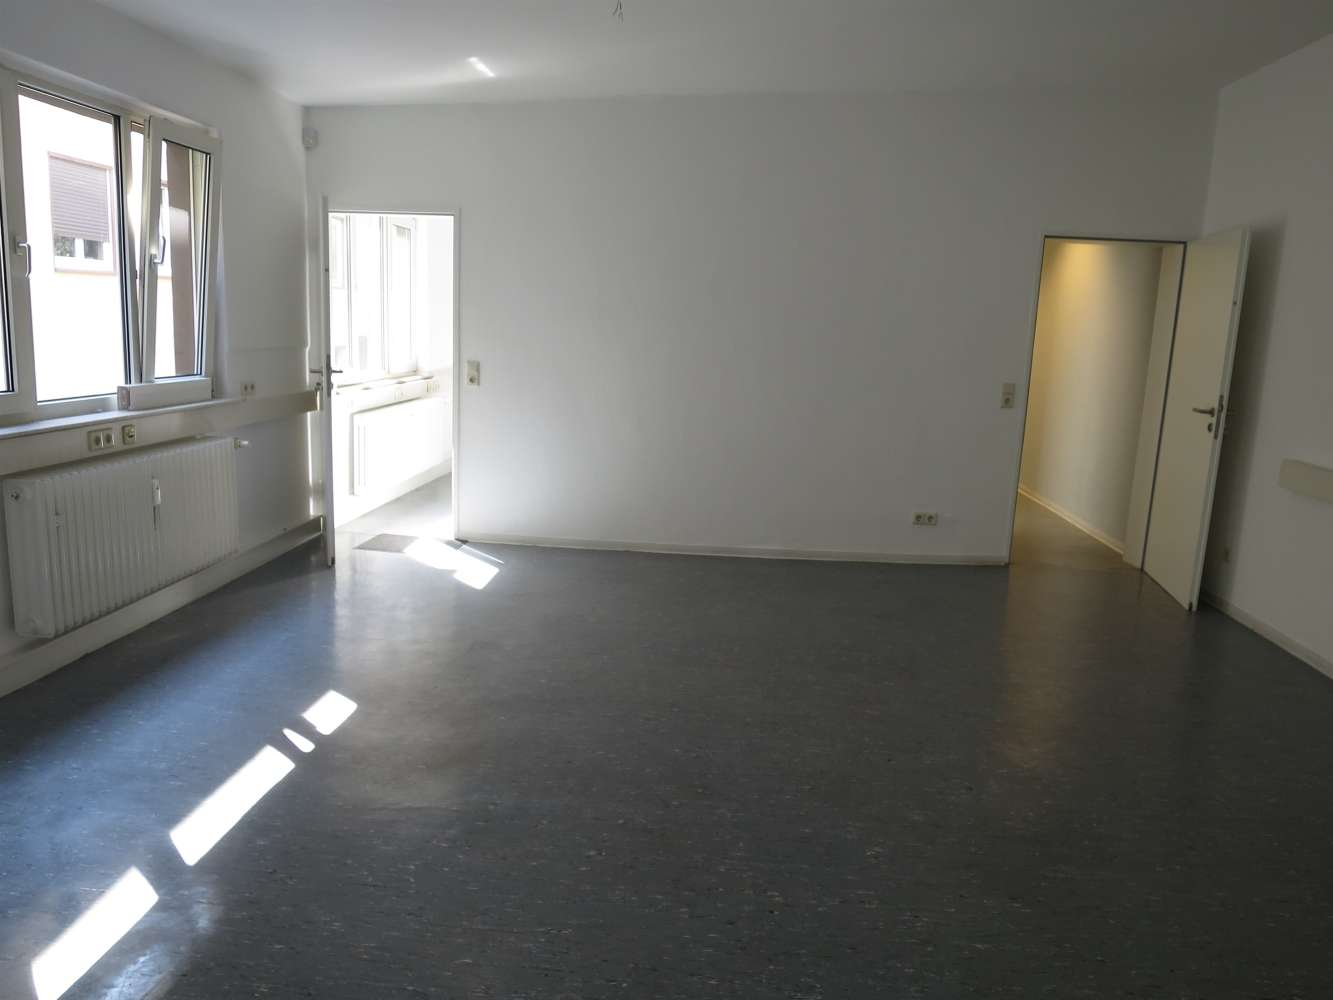 Büros Frankfurt am main, 60318 - Büro - Frankfurt am Main - F2425 - 10611548